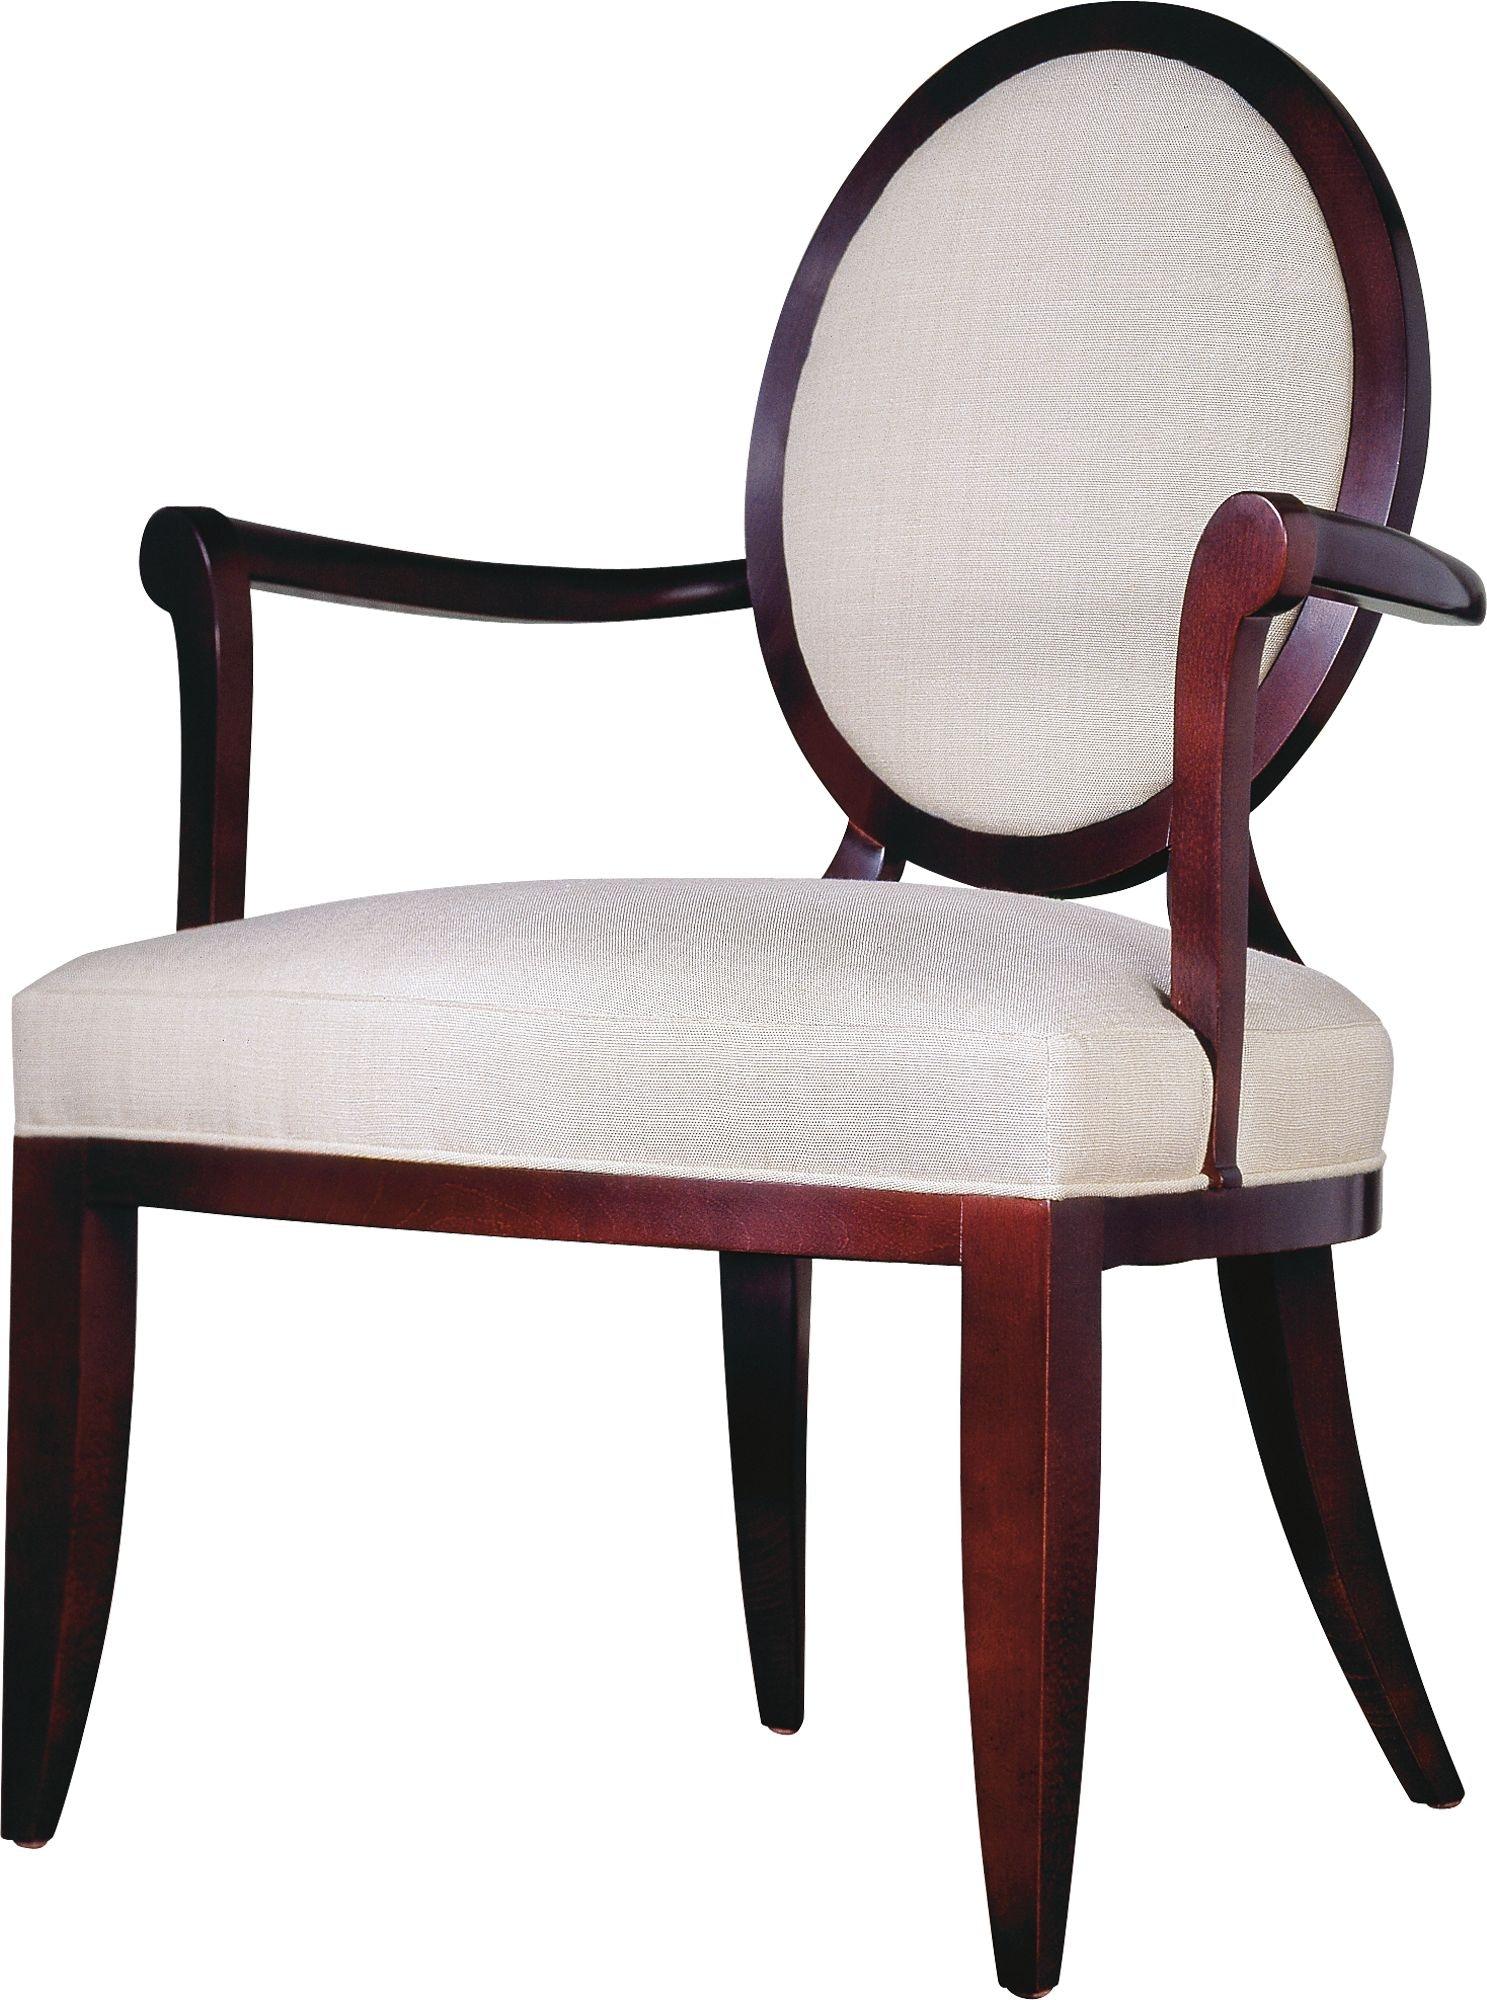 Baker Furniture 3441 Dining Room Barbara Barry Oval X Back Dining